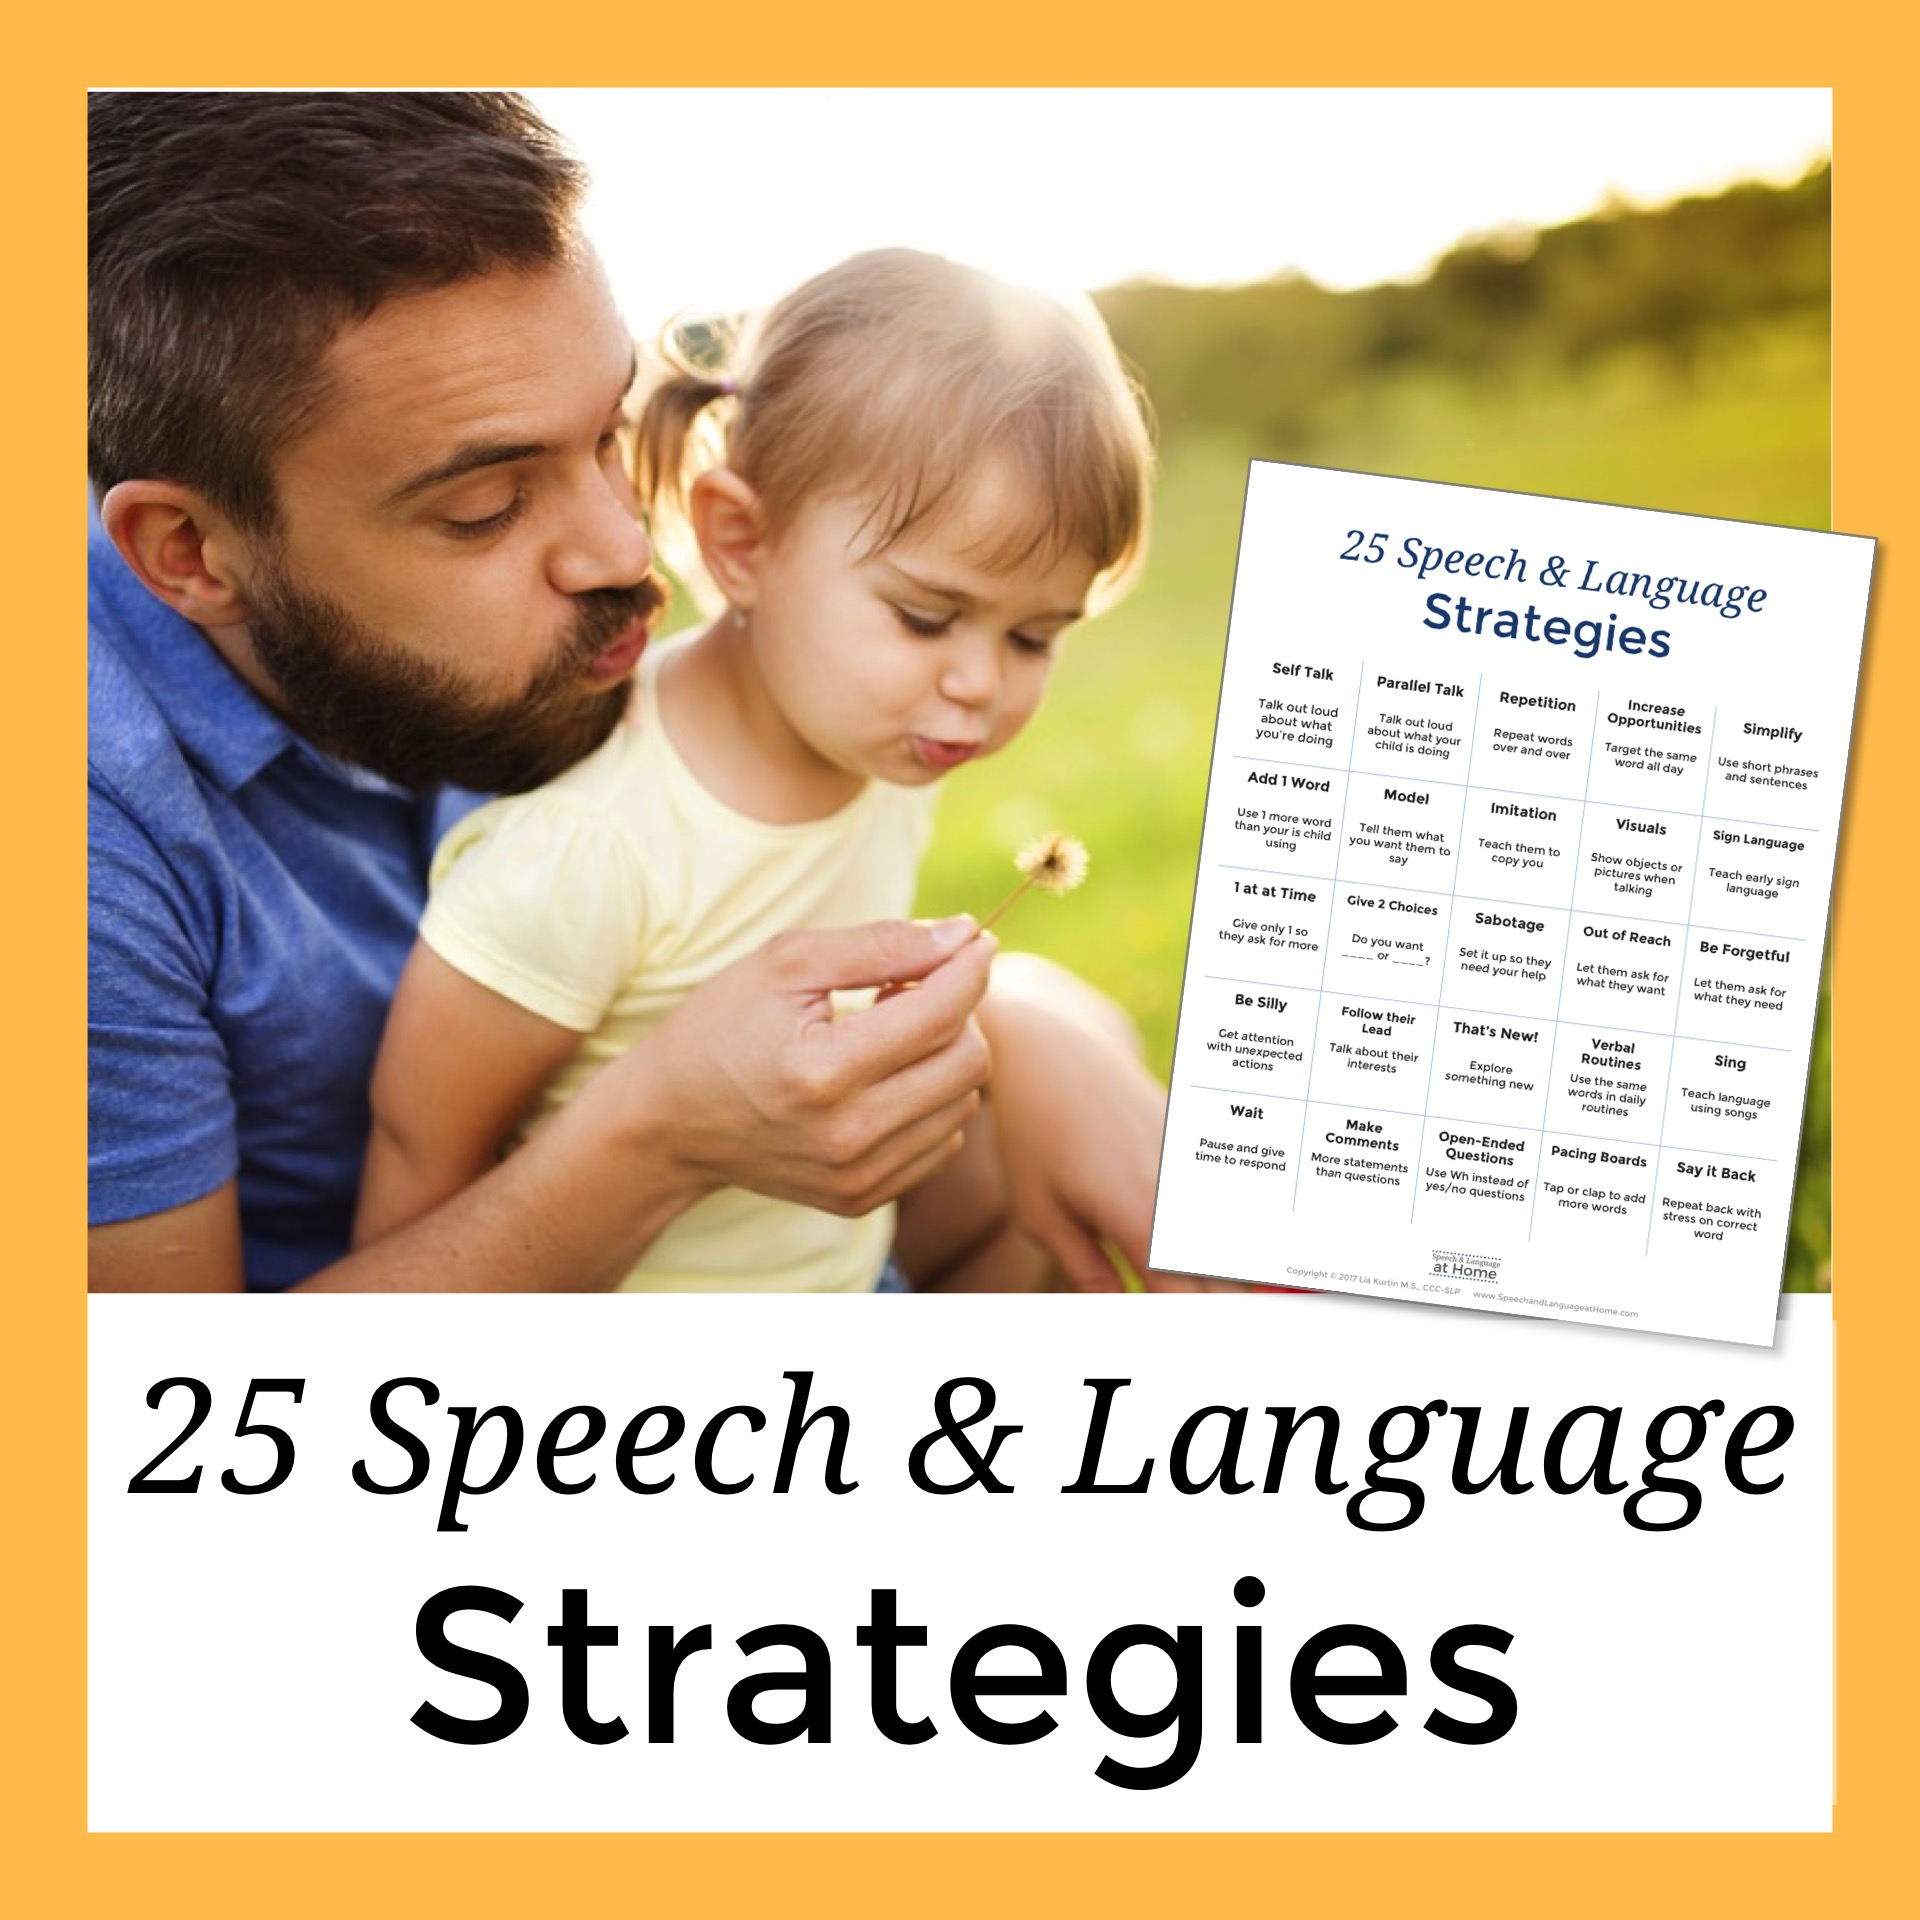 25 Speech and Language Strategies